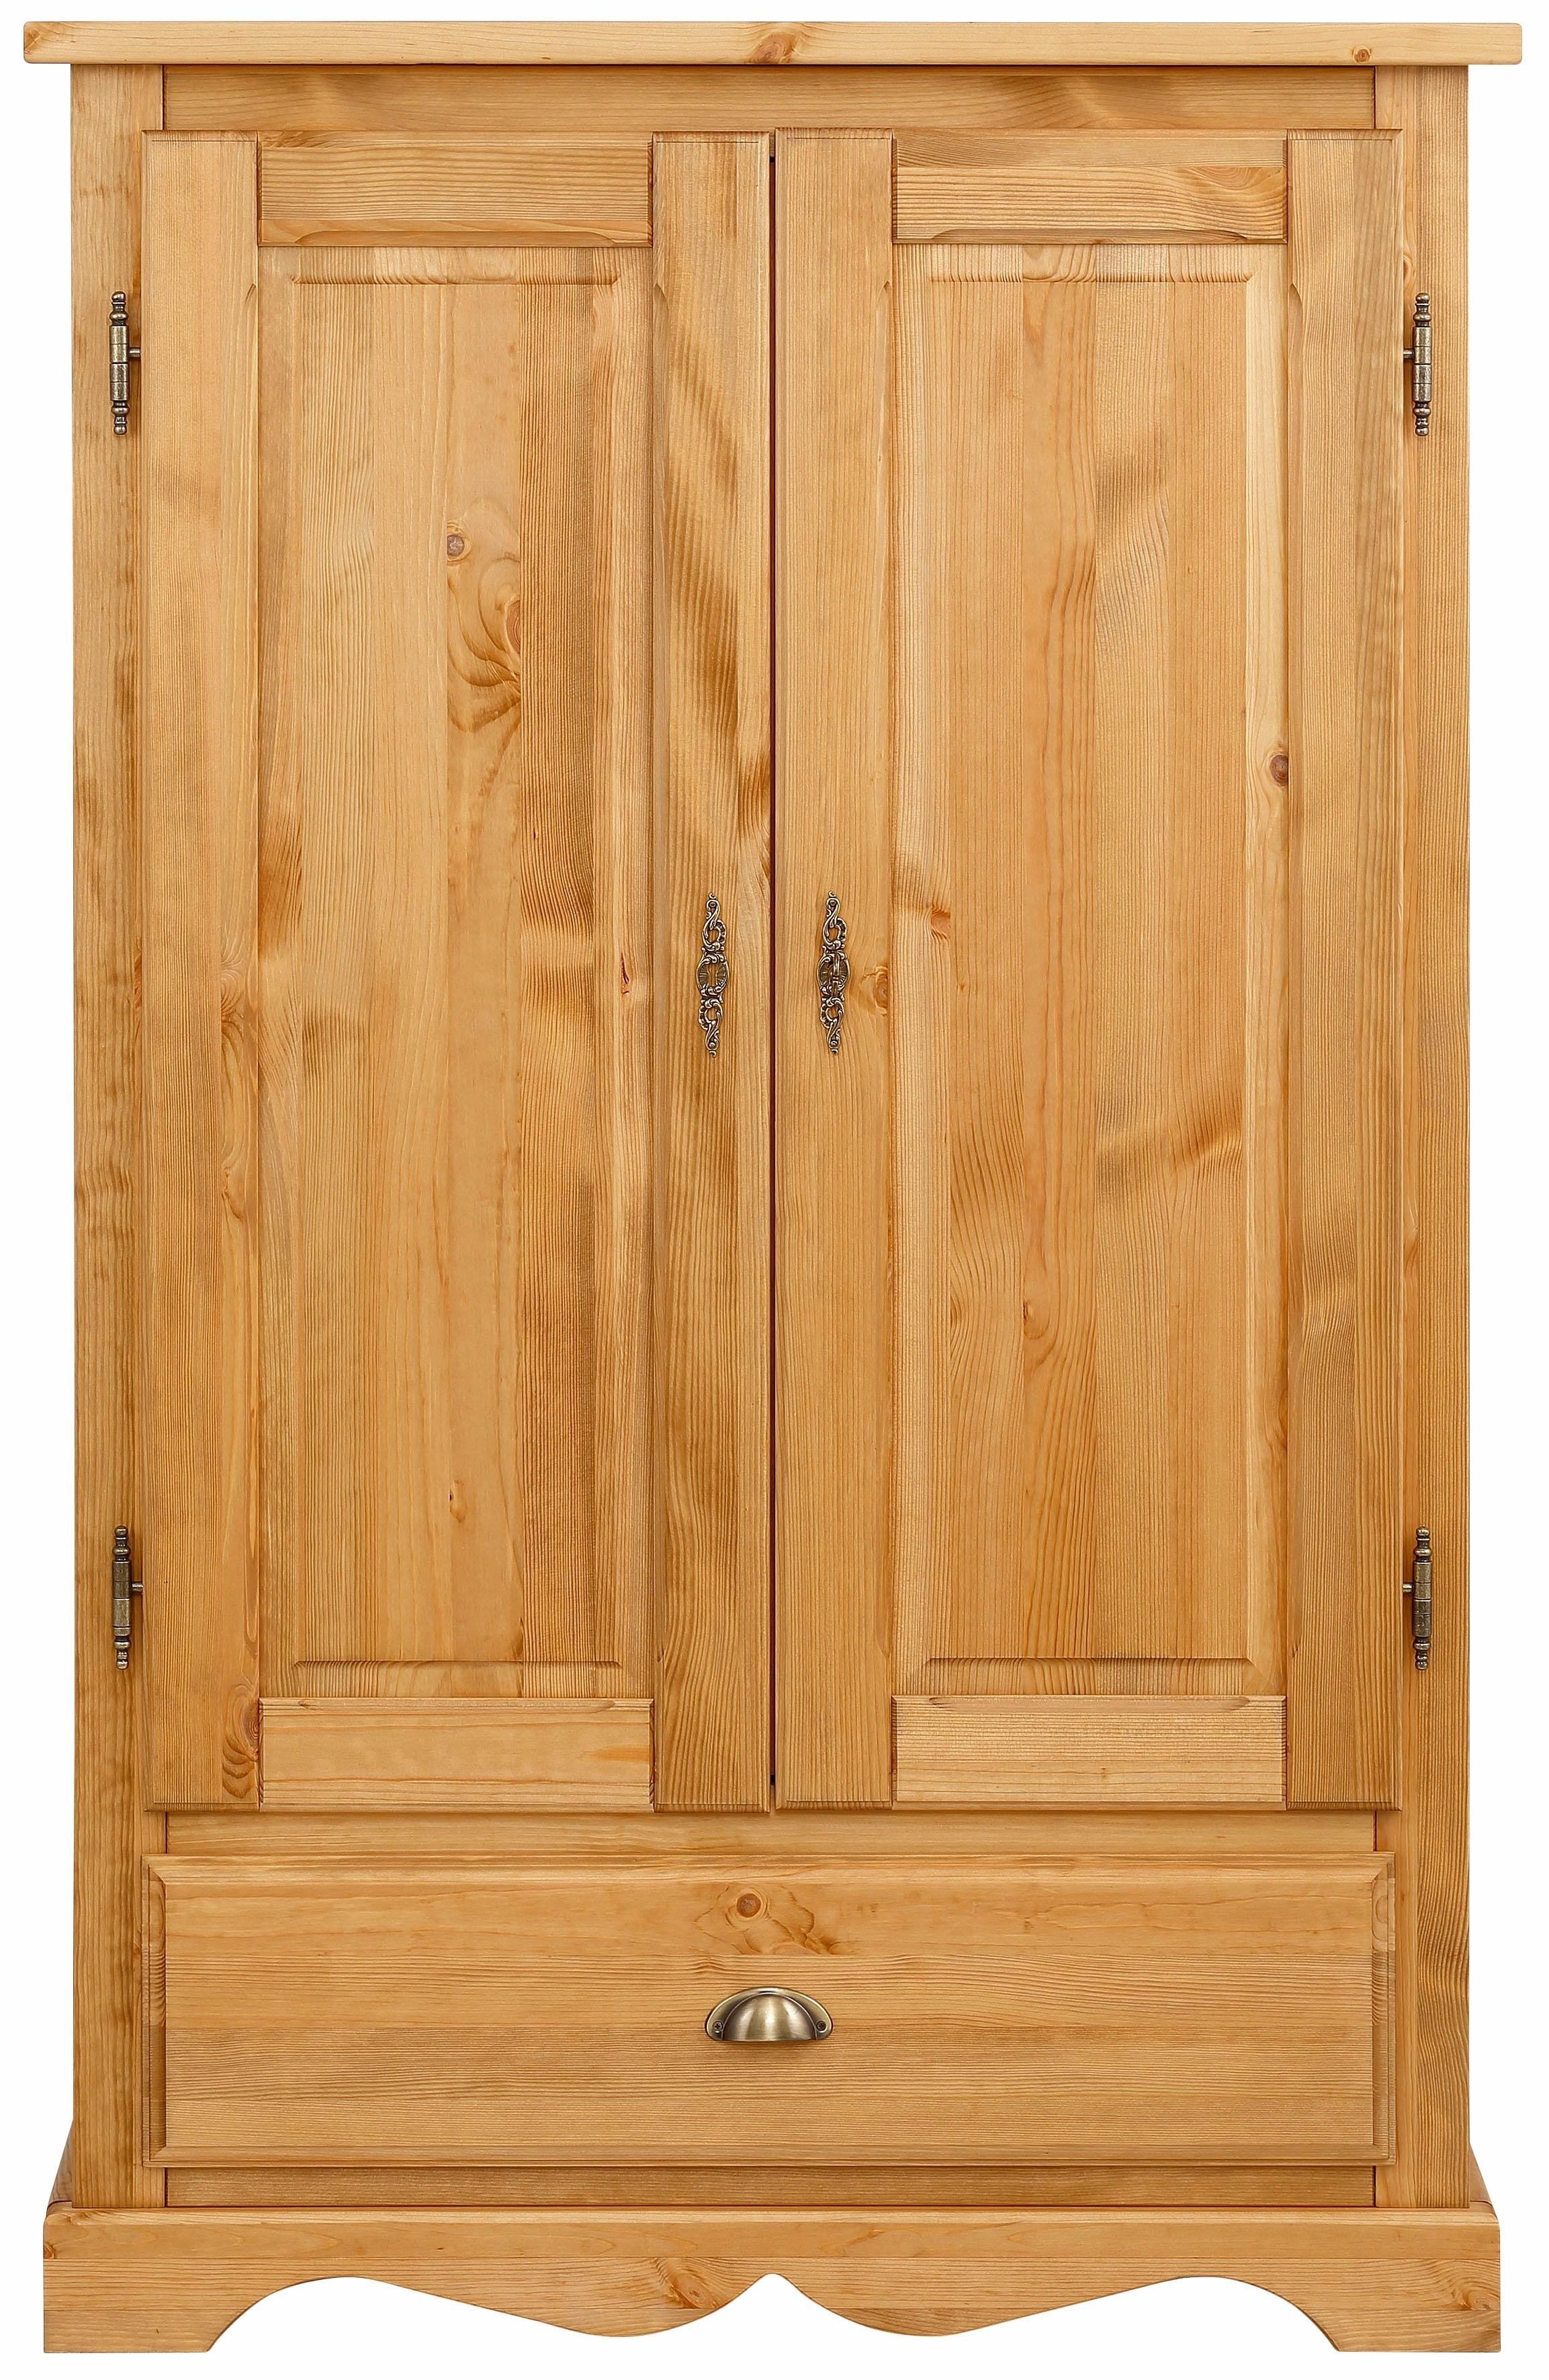 Home affaire linnenkast Teo 2-deurs met 1 lade en 2 losse planken, breedte 95 cm nu online bestellen